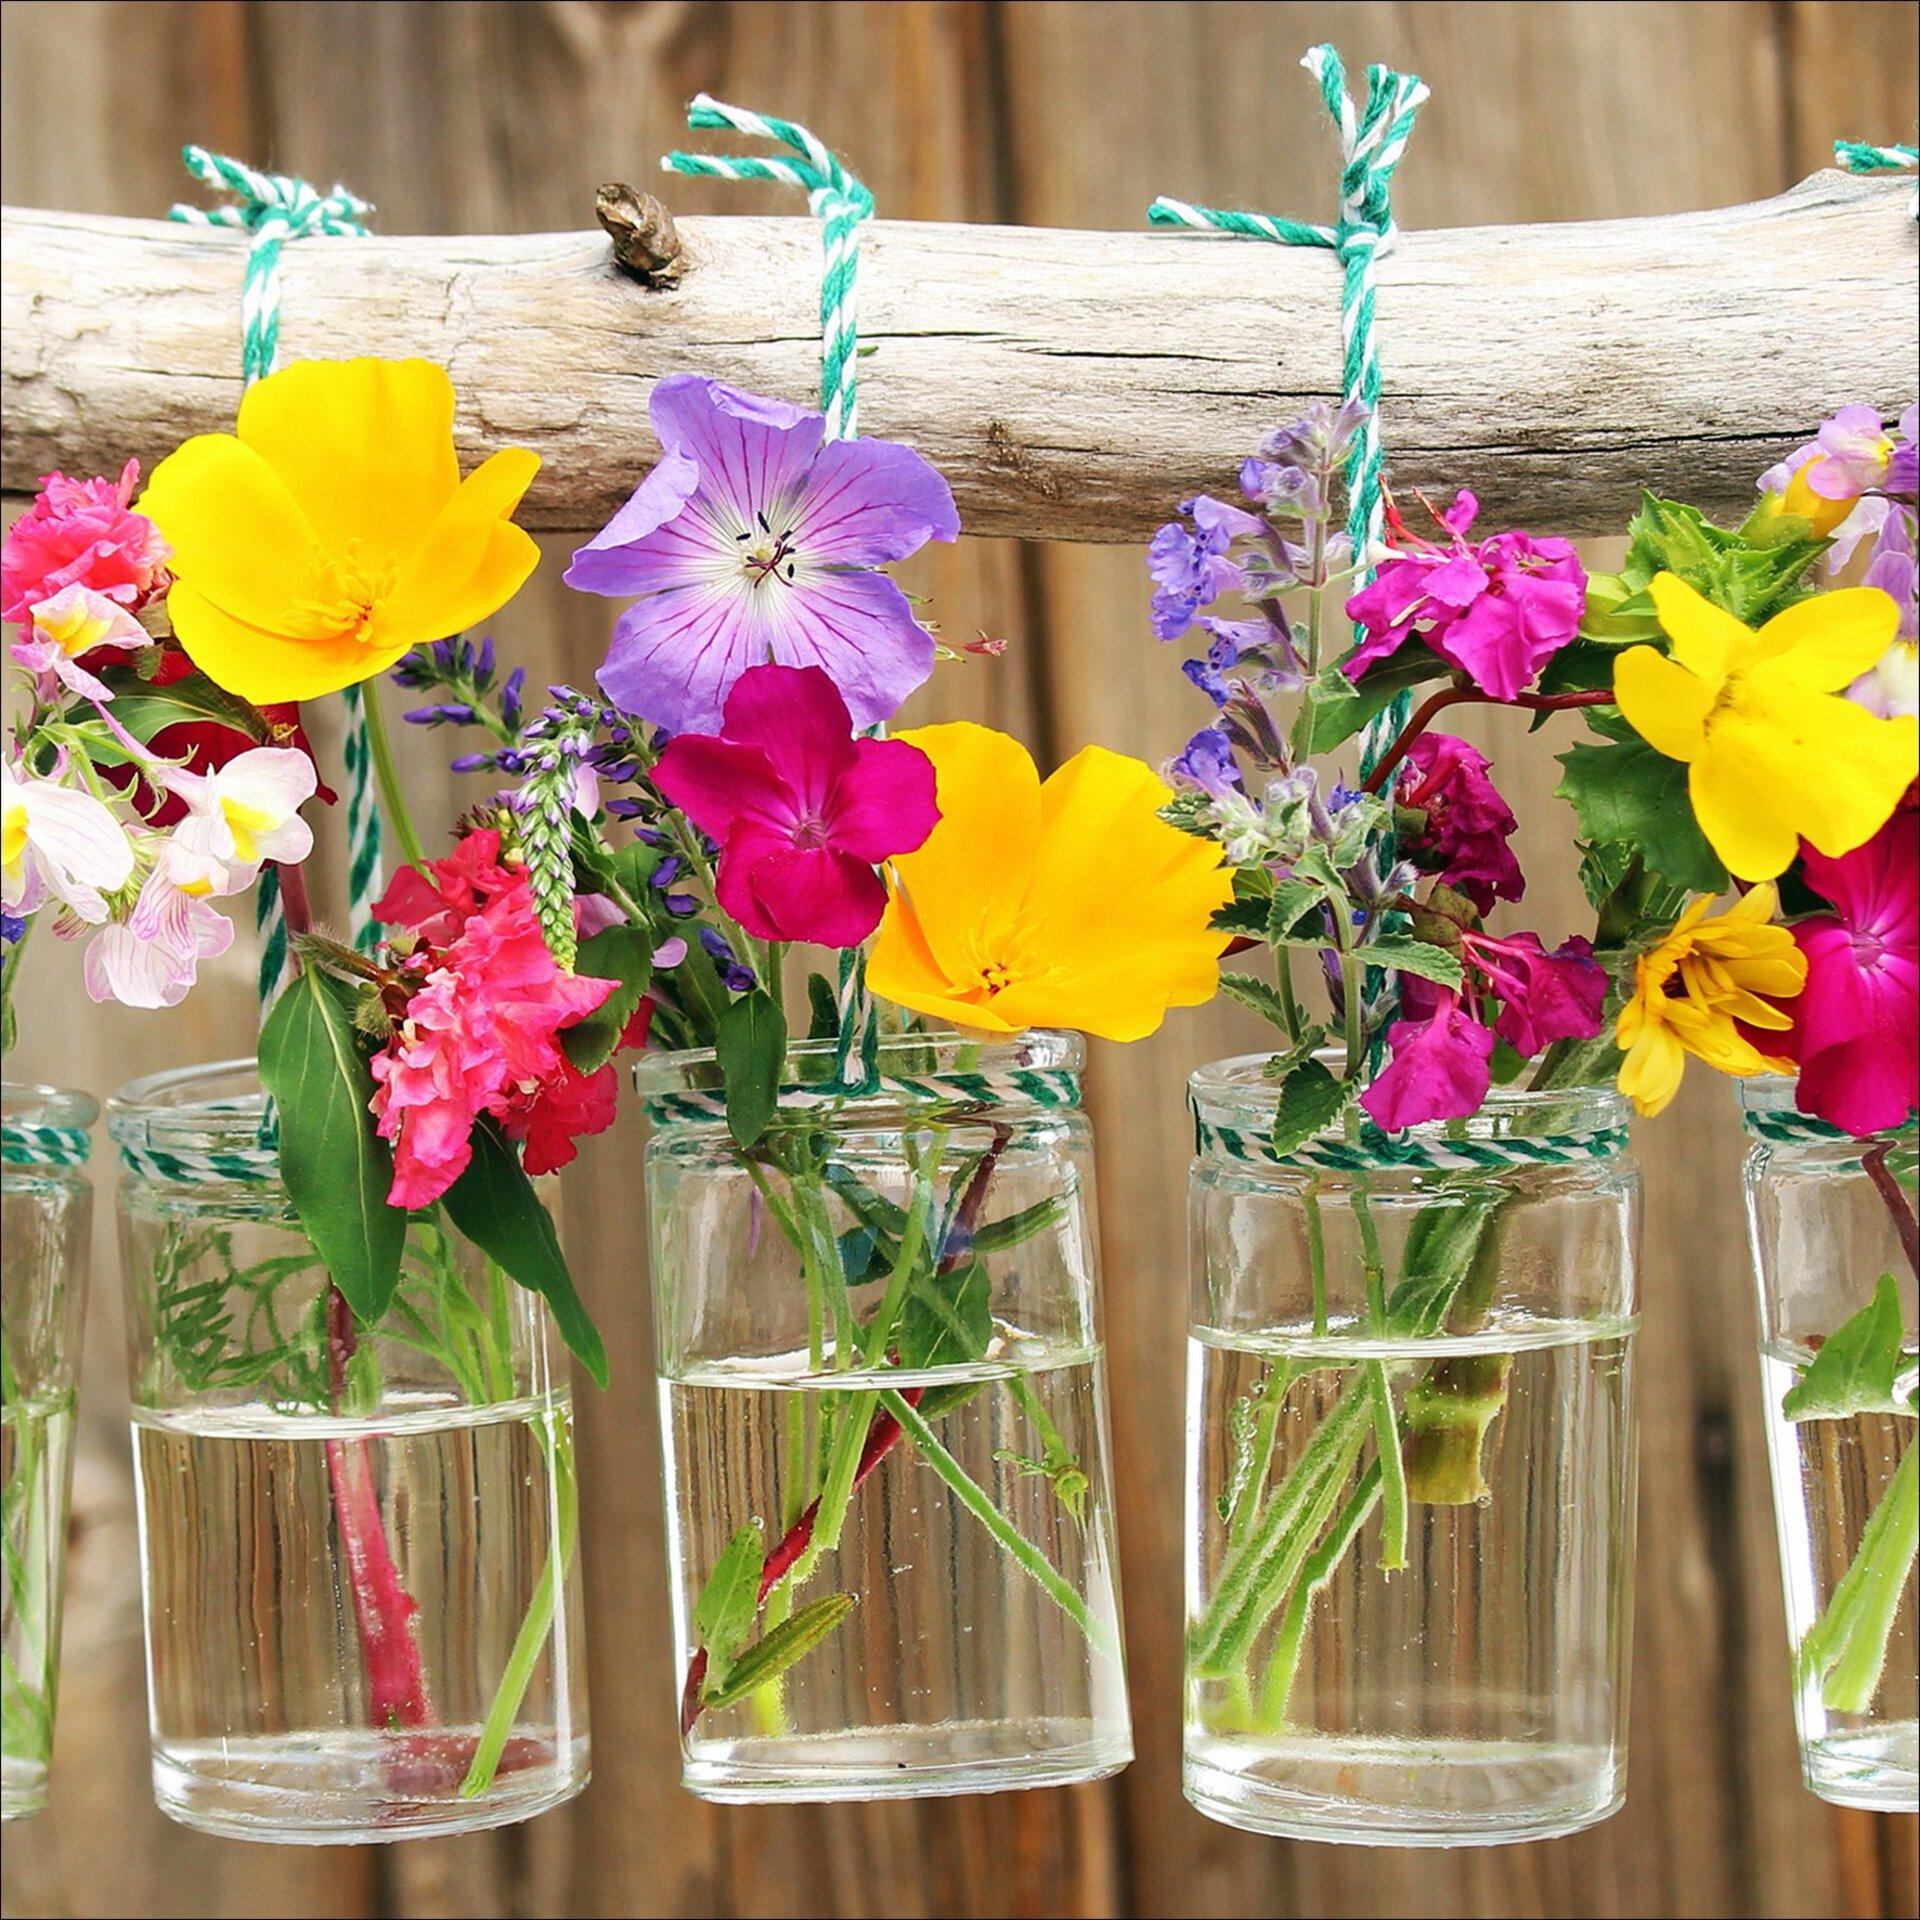 Bild Plants In Vases II Pro-Art Glas 20 x 20 x 1 cm